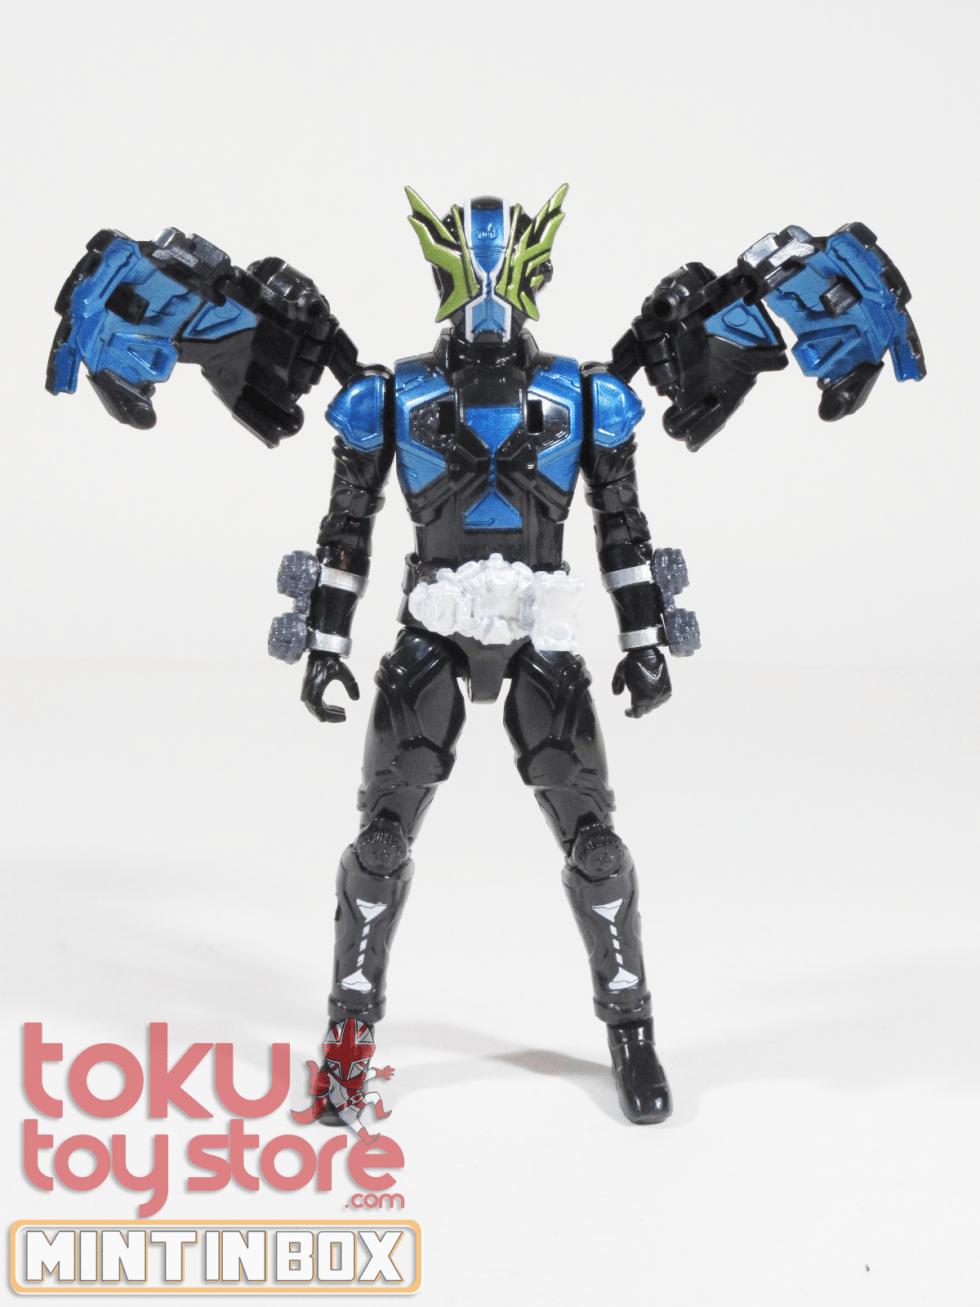 RKF_Geiz Revive_Toku Toy Store (2)